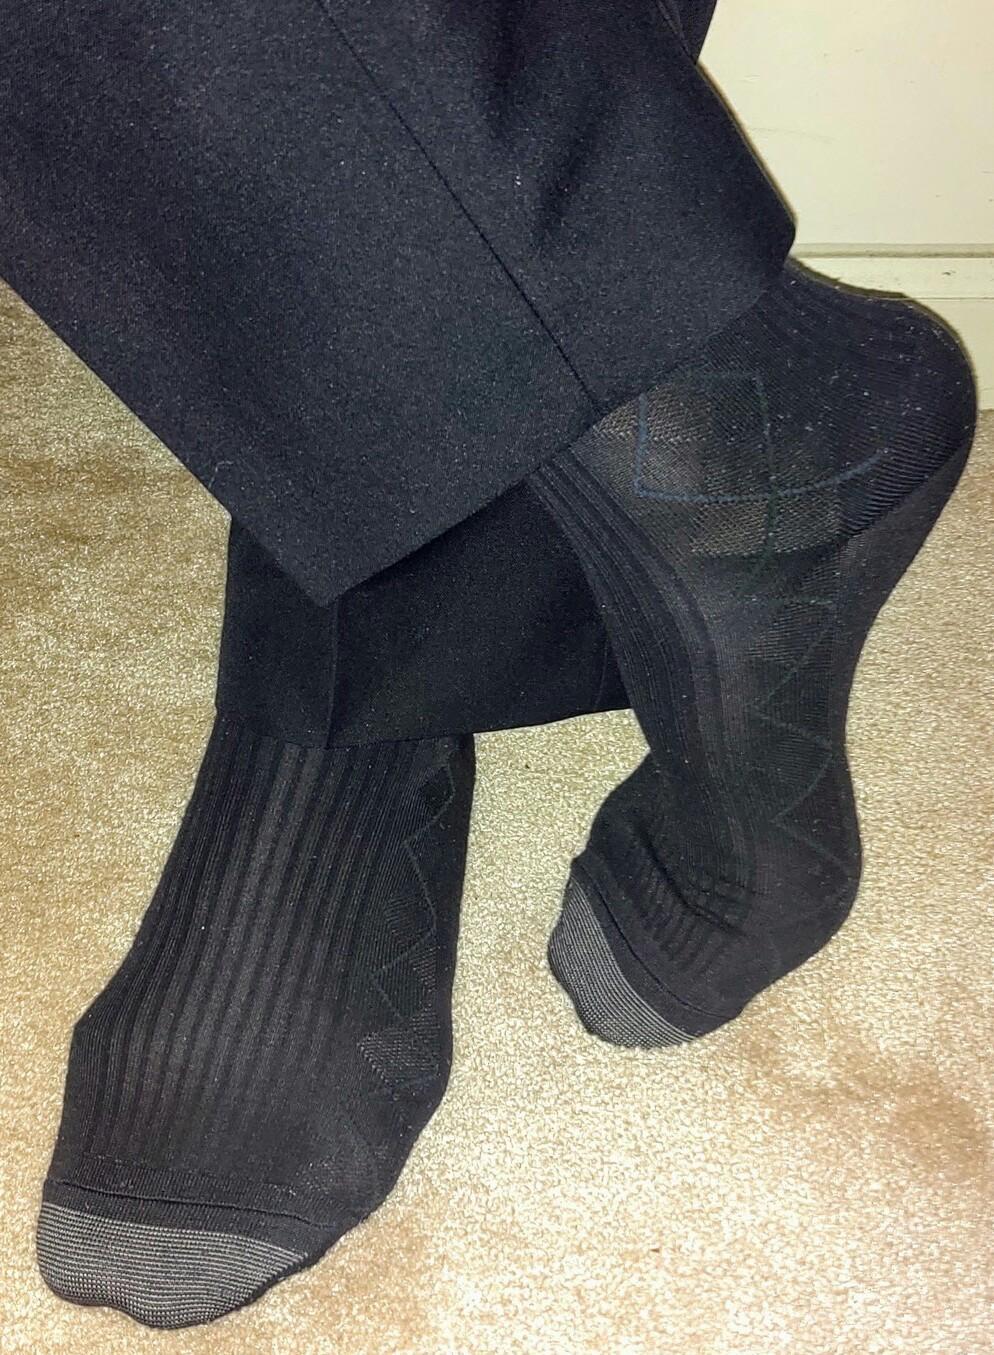 I Love Men Socks Mens Dress Socks Mens Socks Fashion Sheer Socks [ 1355 x 994 Pixel ]